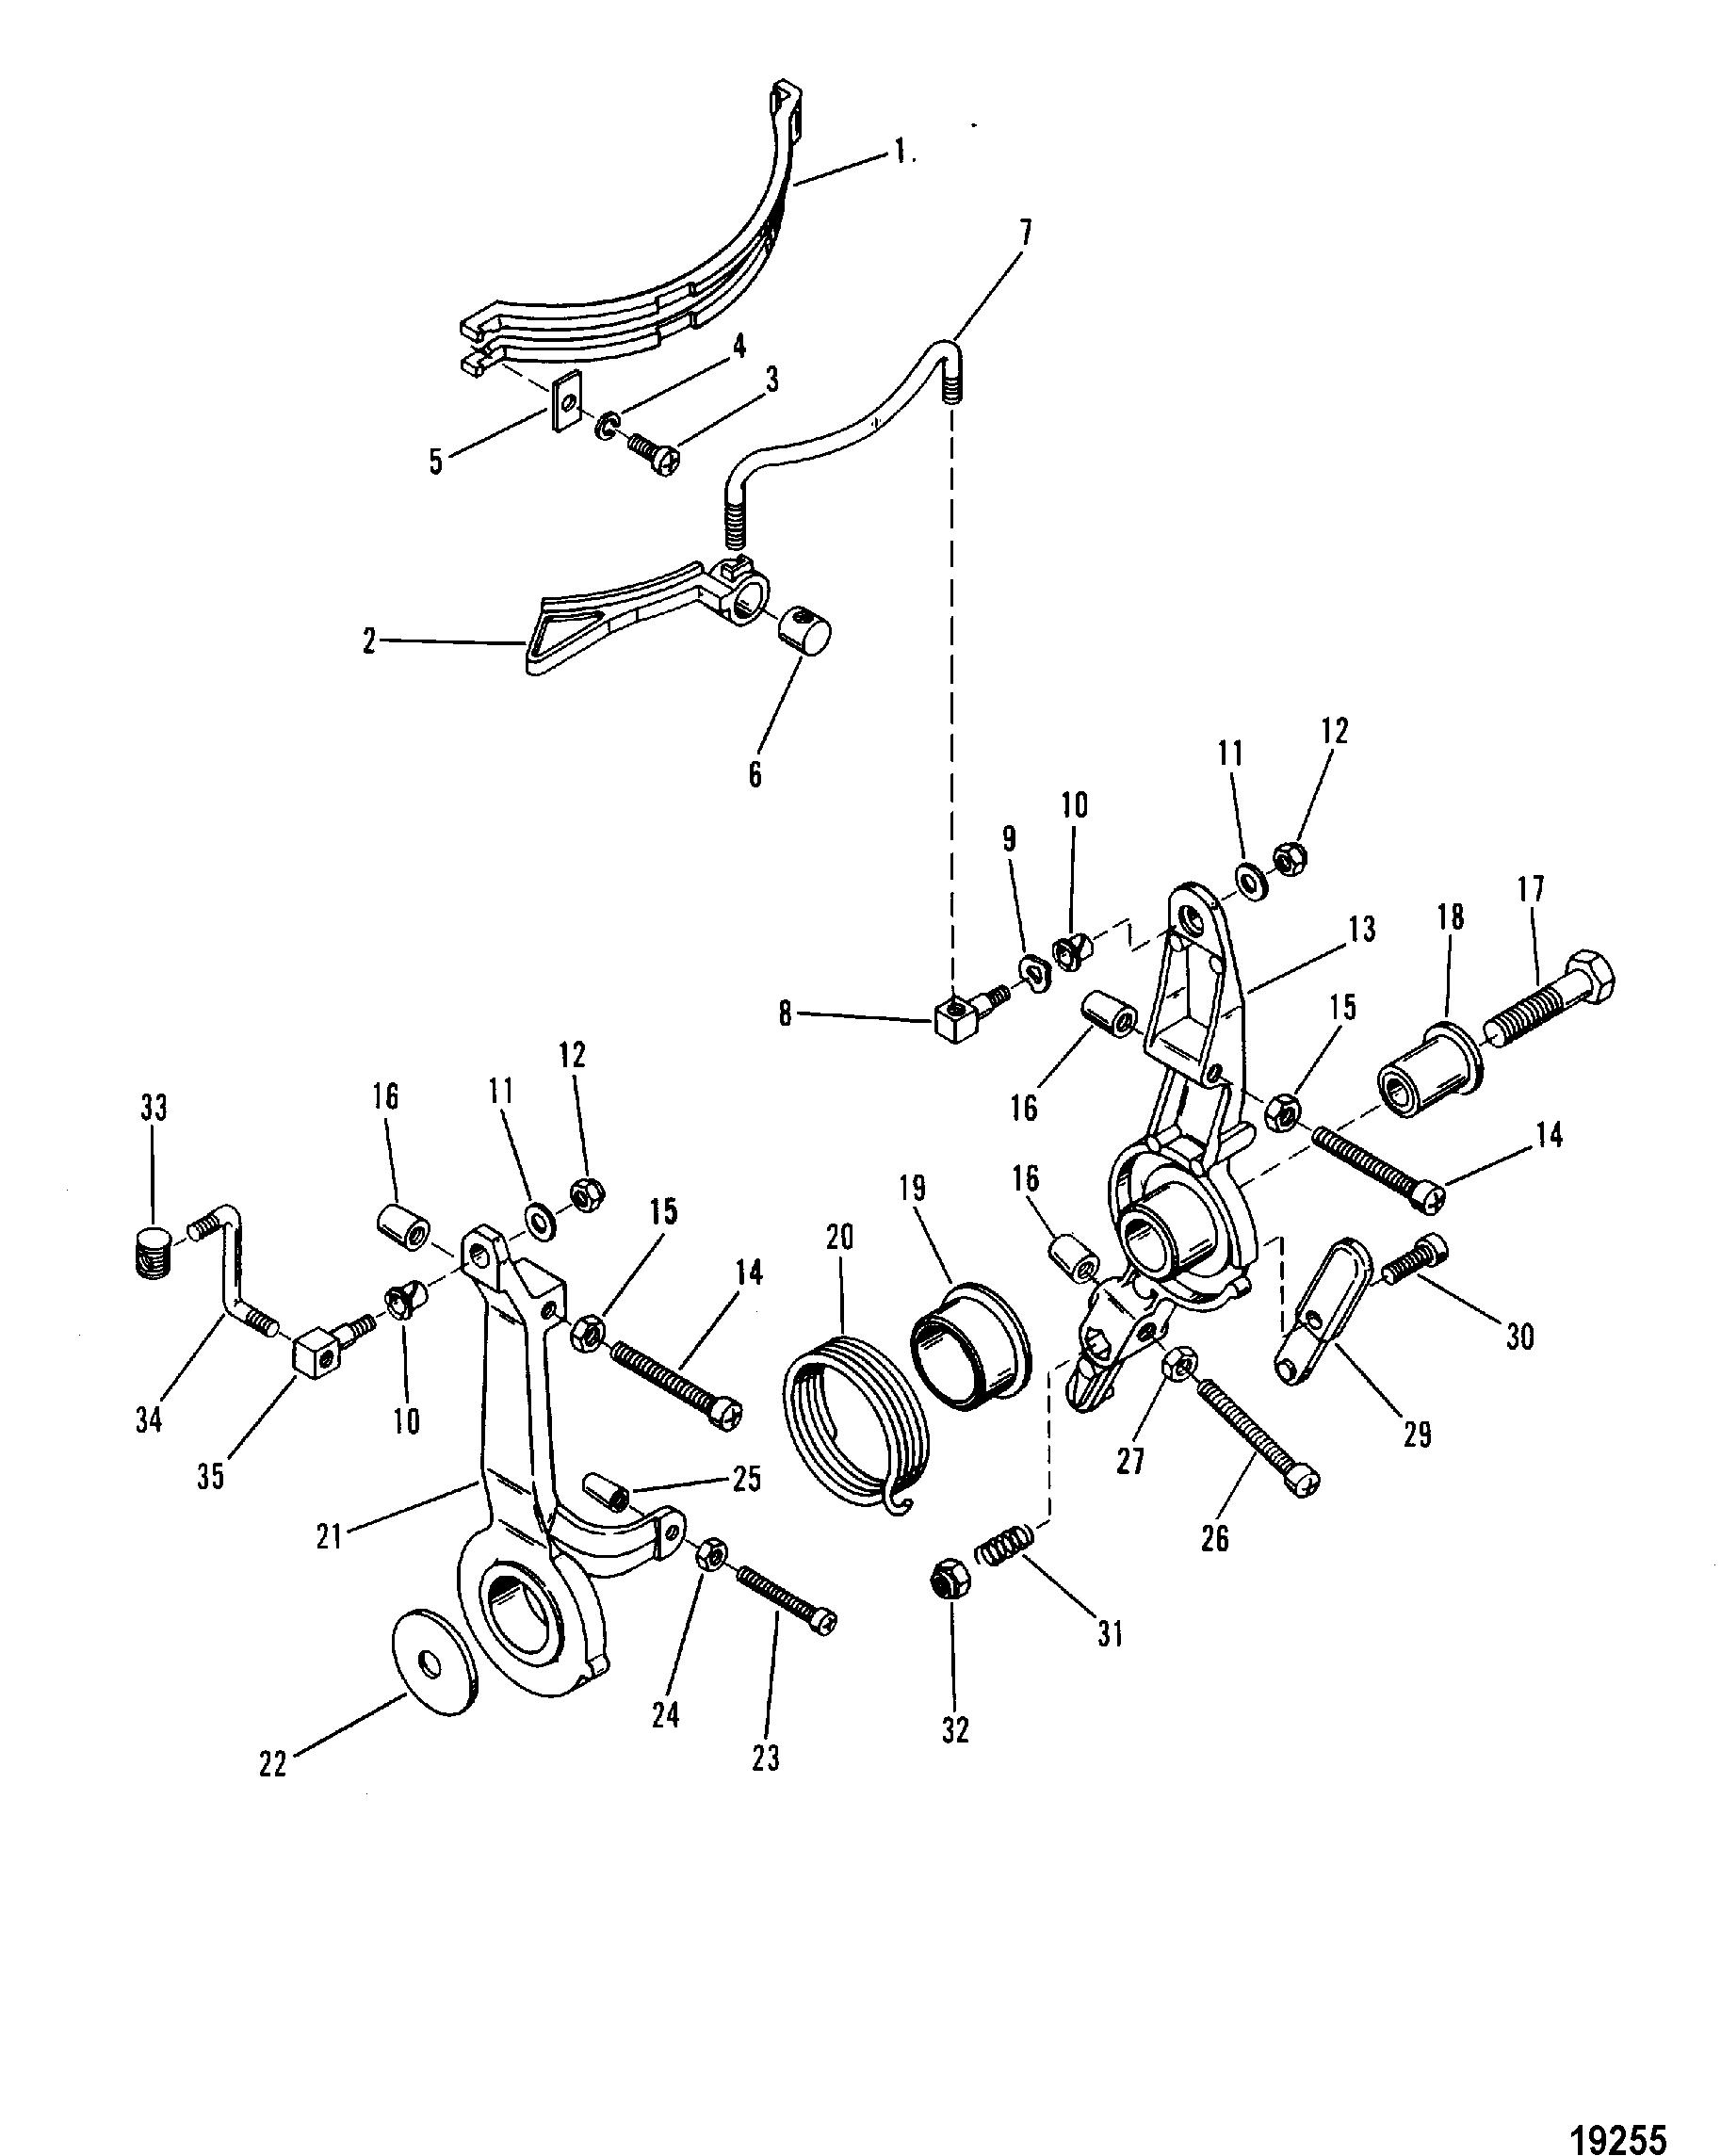 Mariner Throttle Control Wiring Diagram Trusted Diagrams 80 Mercury Outboard Free Vehicle U2022